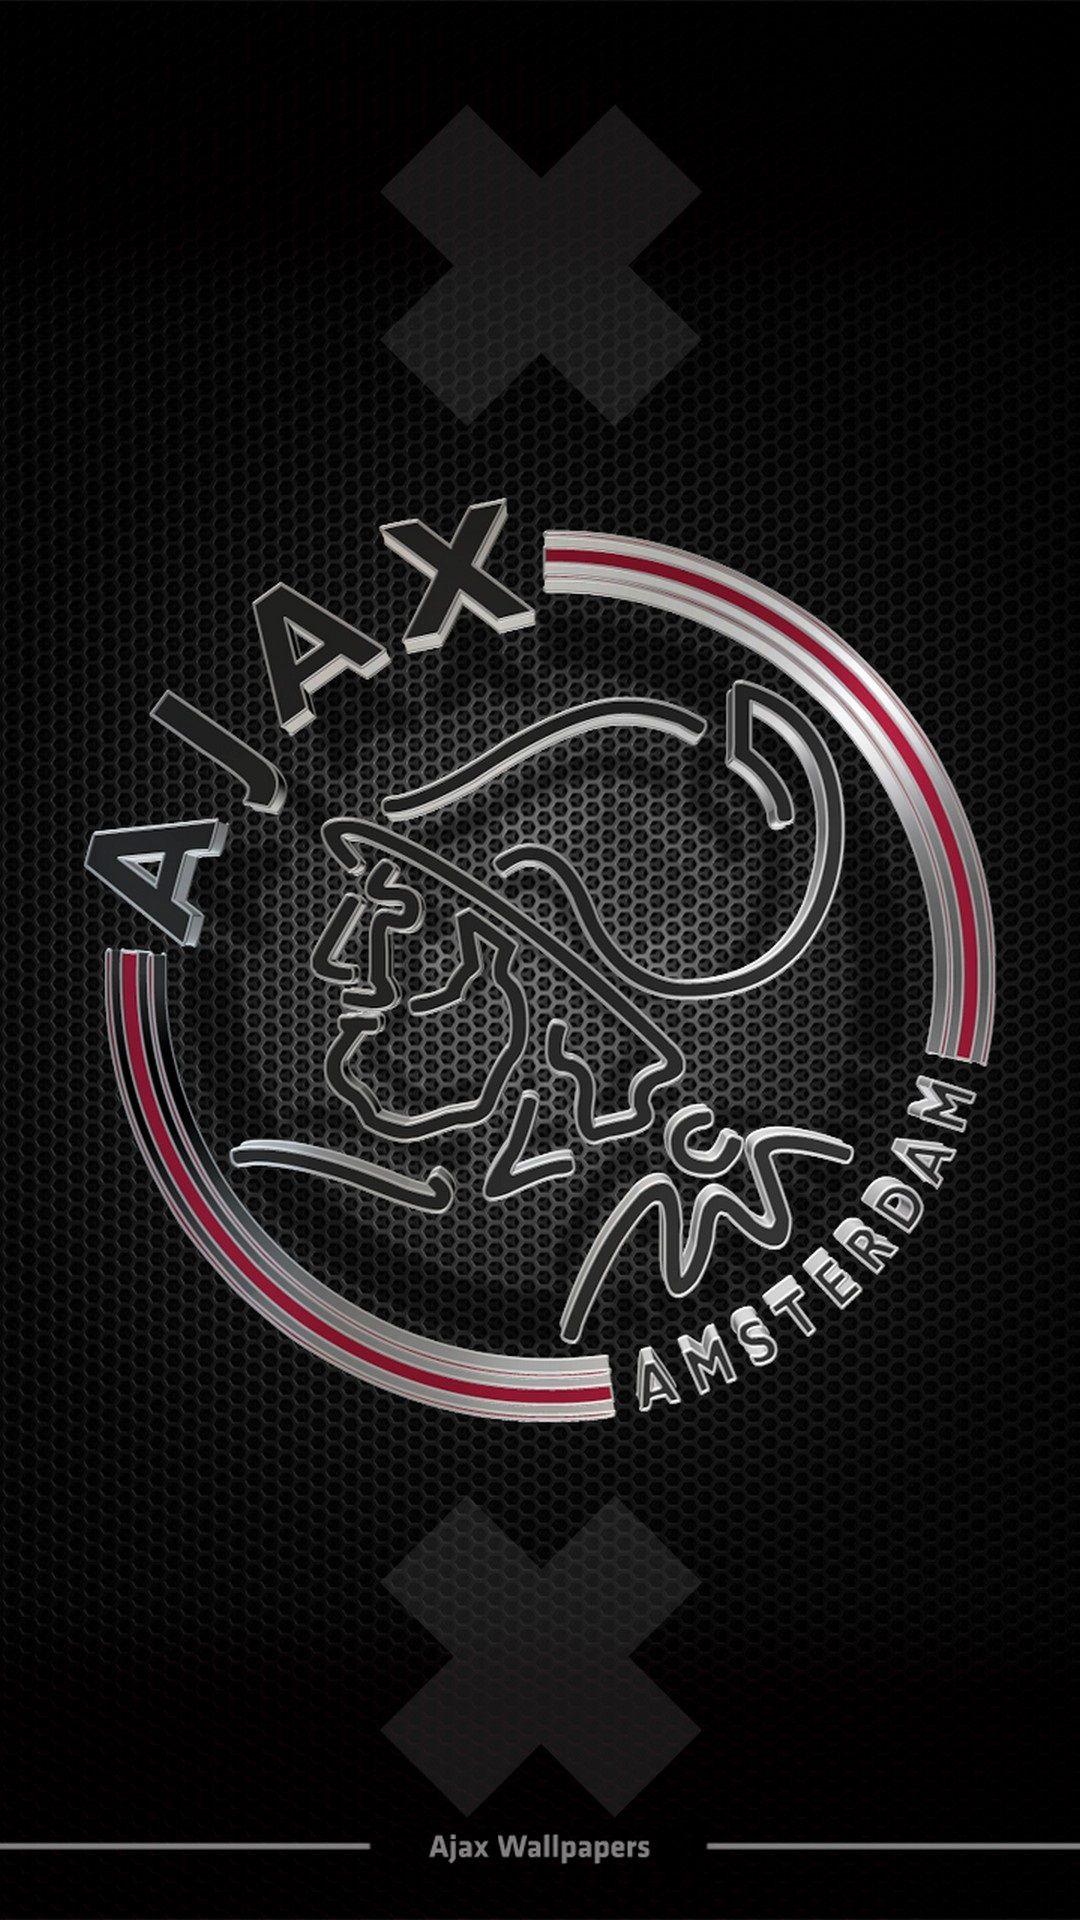 Iphone 8 Wallpaper Ajax Best Iphone Wallpaper Football Wallpaper Best Iphone Wallpapers Ajax